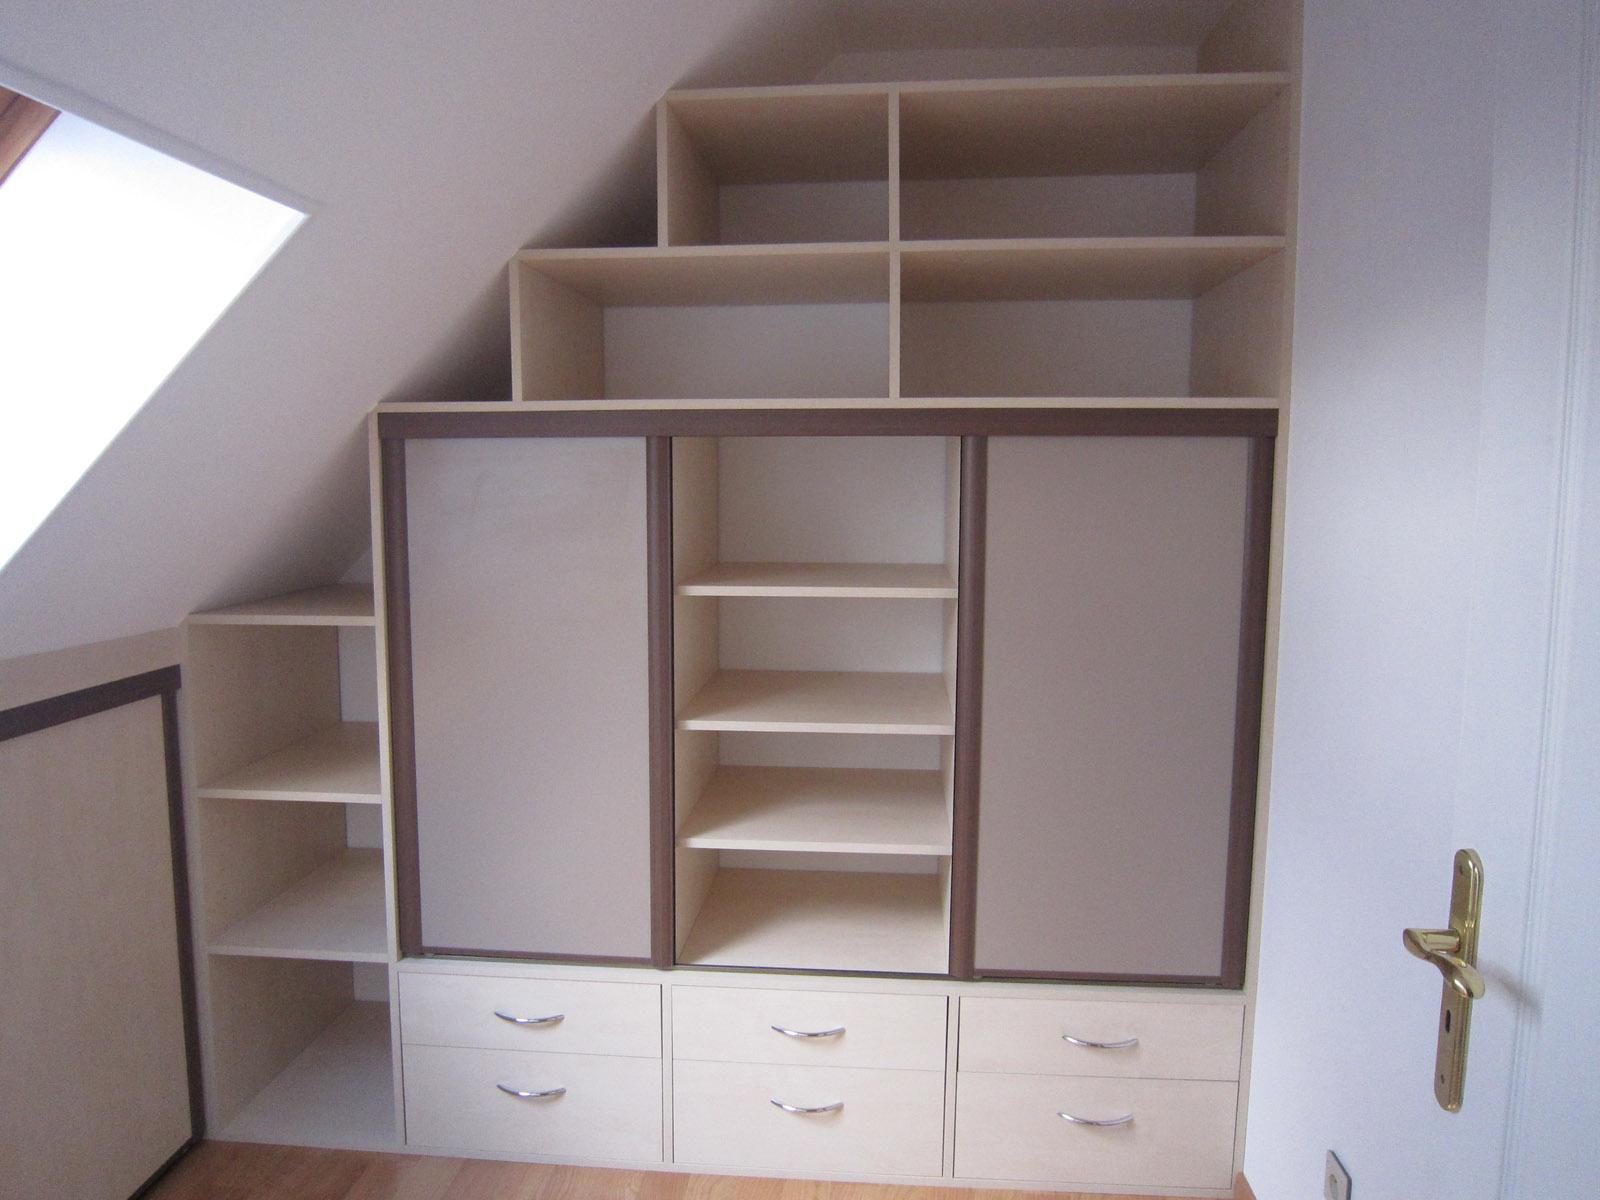 les r alisations dressing cuisines couloir. Black Bedroom Furniture Sets. Home Design Ideas